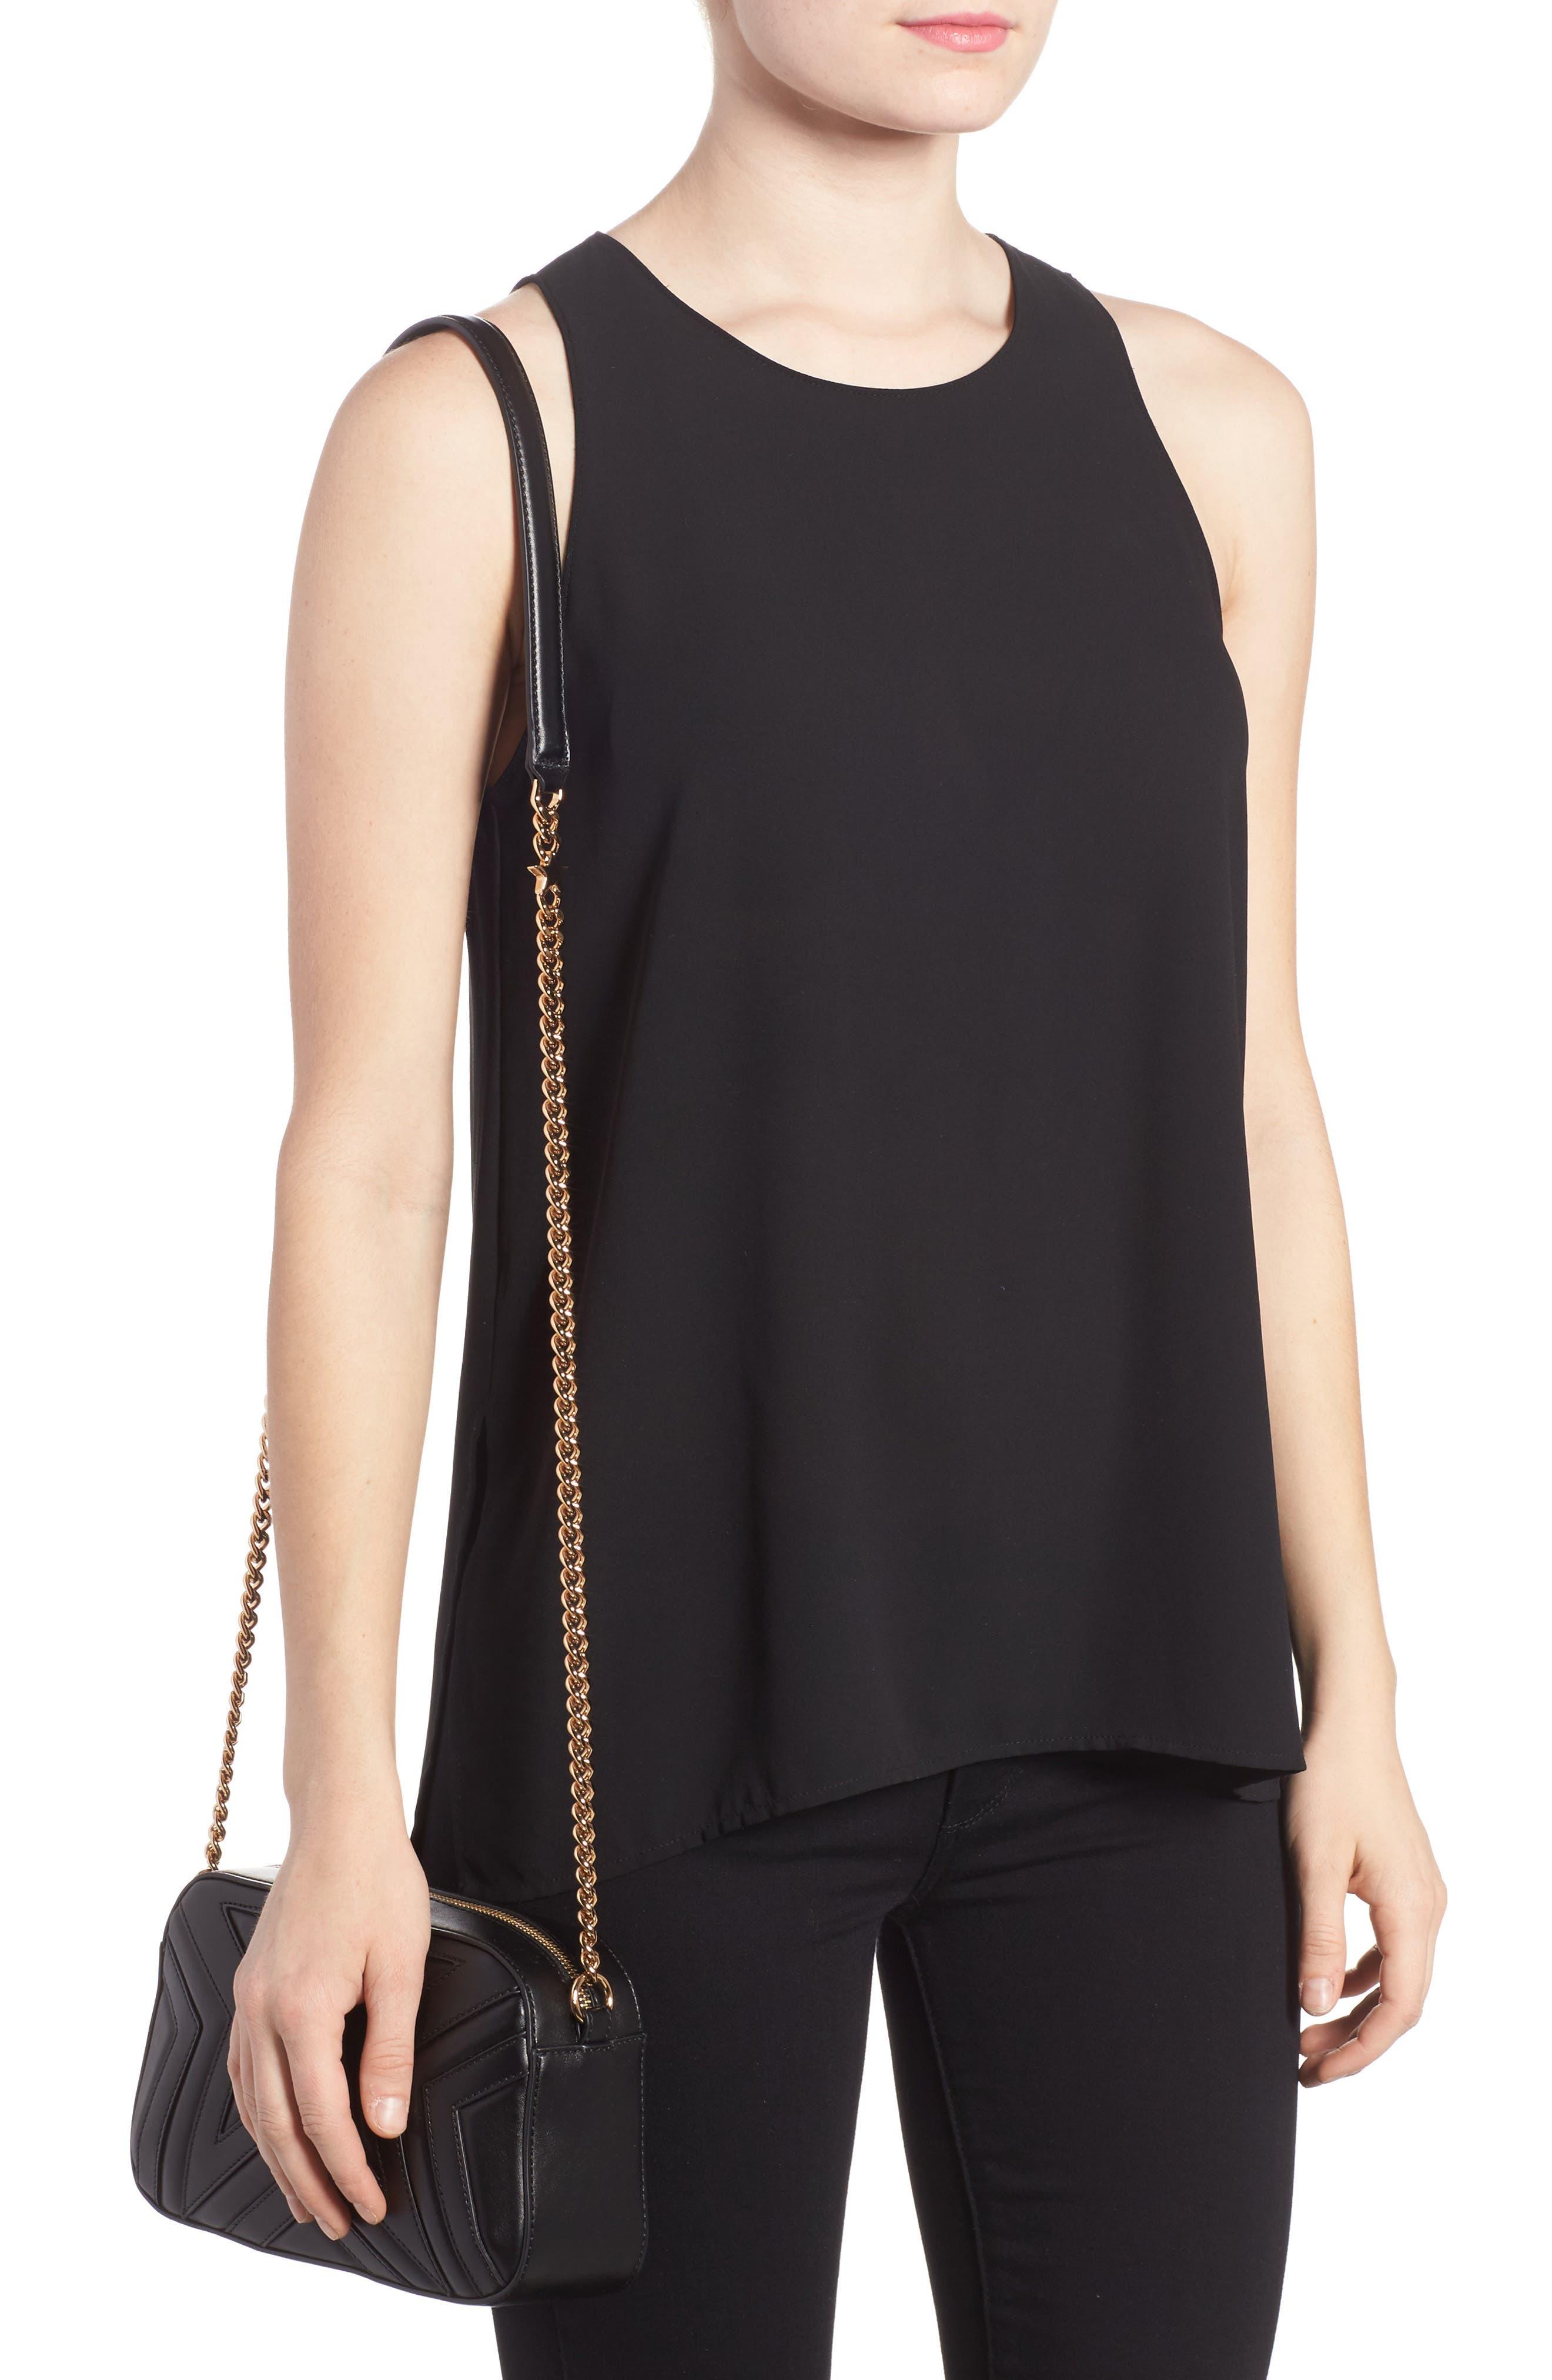 Alter Nappa Faux Leather Shoulder Bag,                             Alternate thumbnail 2, color,                             BLACK